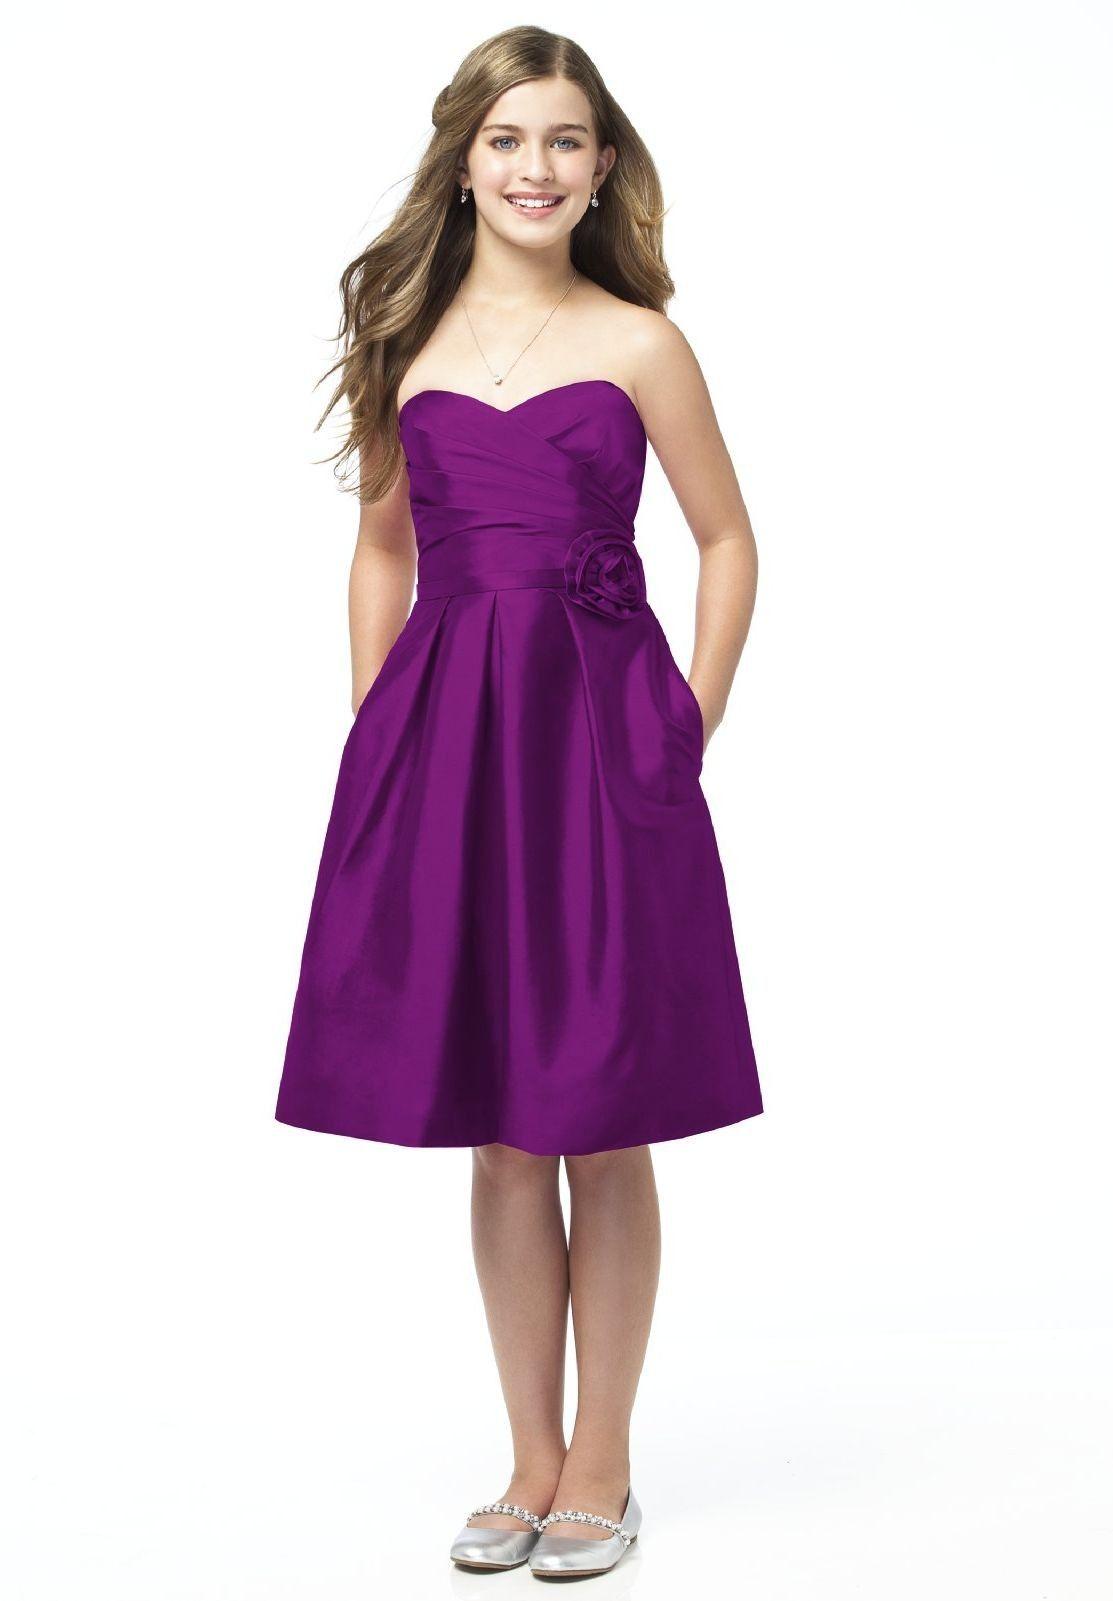 Satin Strapless Sweetheart A-line Knee-length Junior Bridesmaid Dress - Bridesmaid - Fashionweddingdress.co.uk